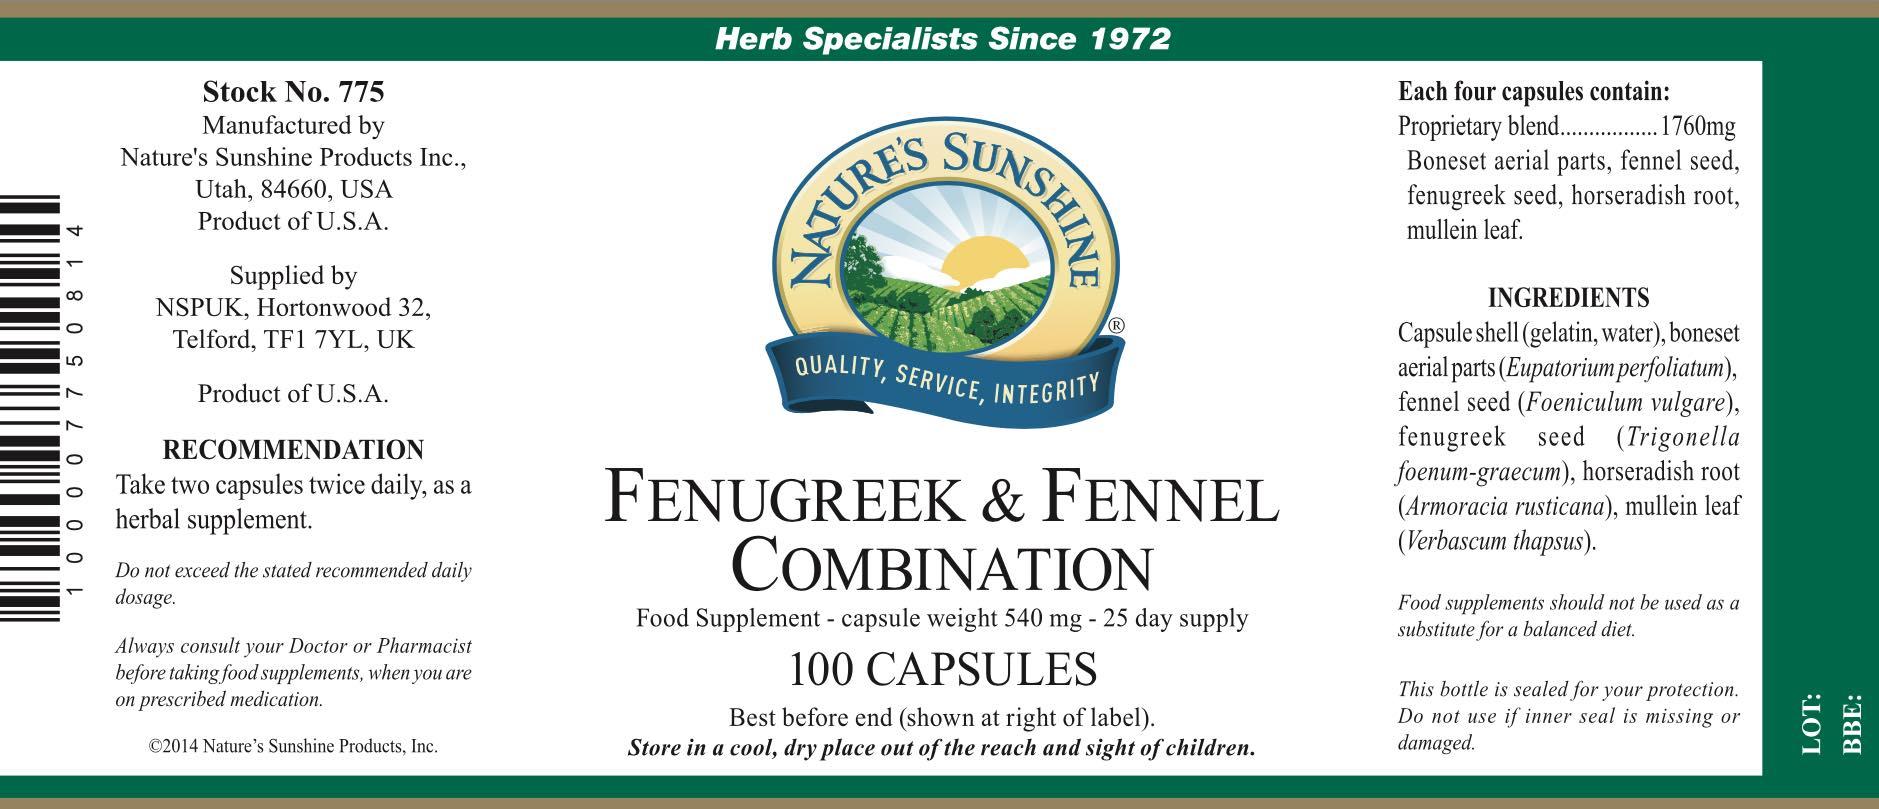 Nature's Sunshine Fenugreek & Fennel Combination - Label